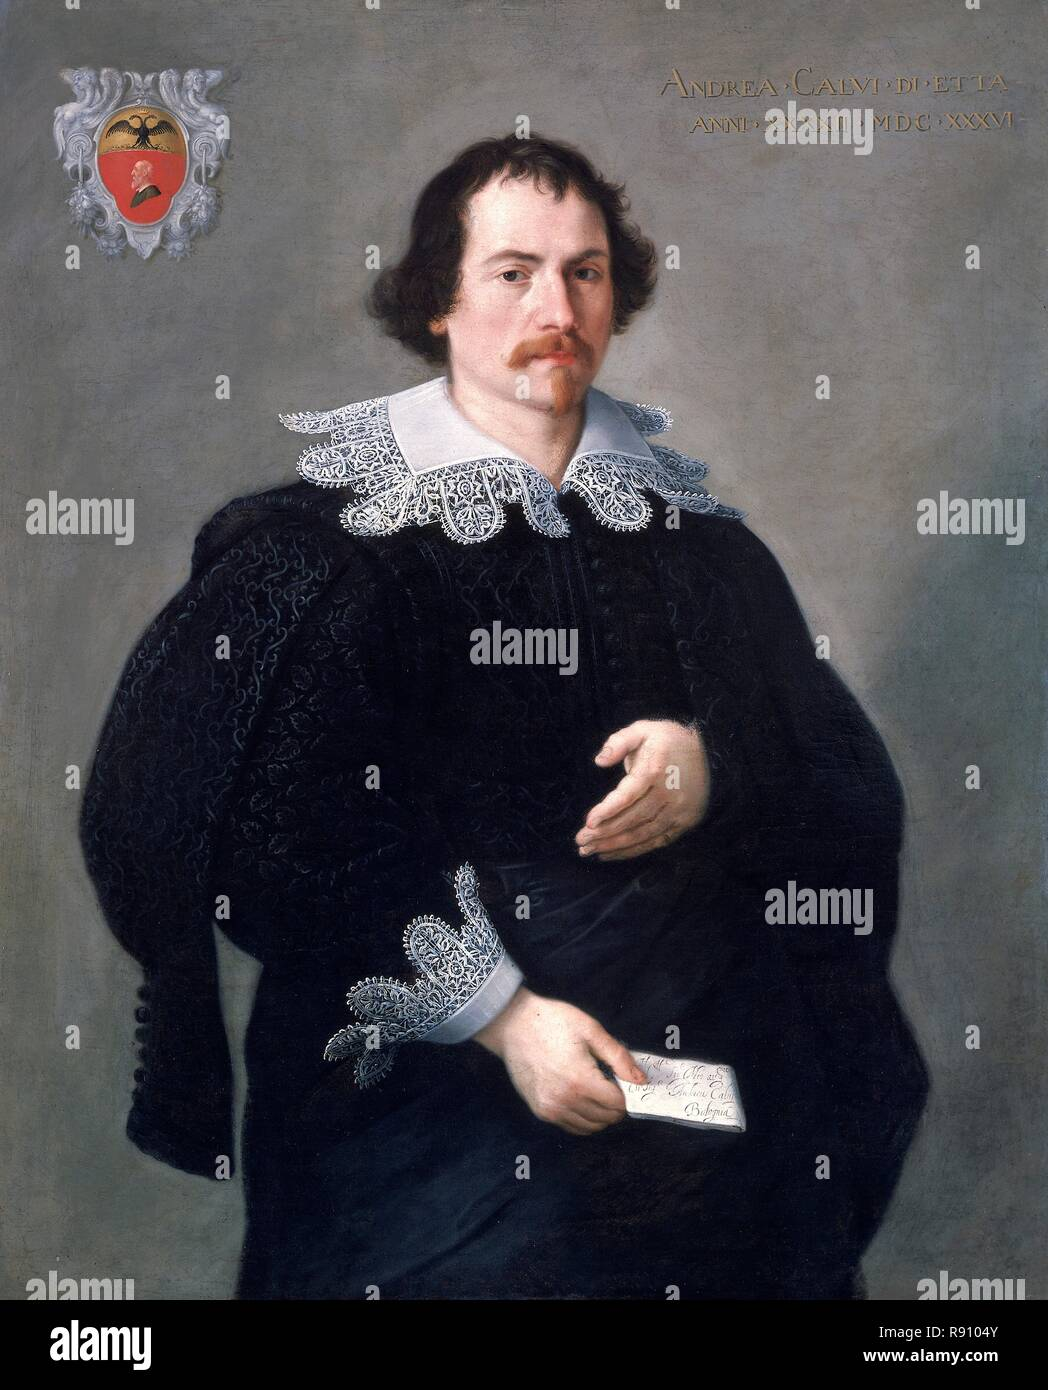 Andrea Albani andrea calvi (b.1590), 1636. creator: francesco albani stock